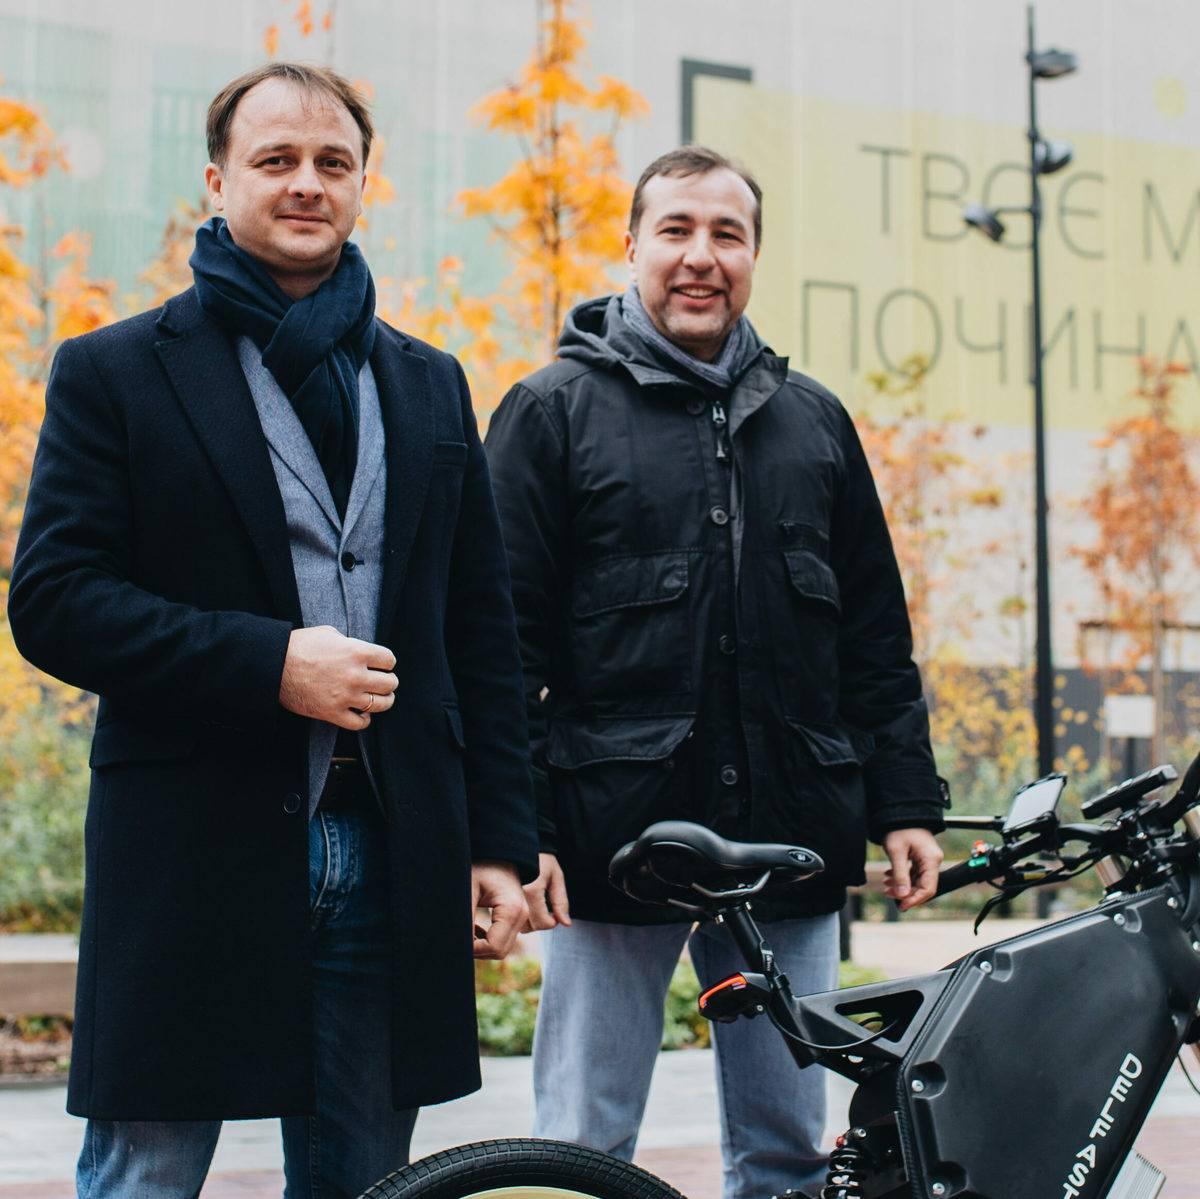 Delfast Founders: Daniel Tonkopiy and Serhii Denysenko